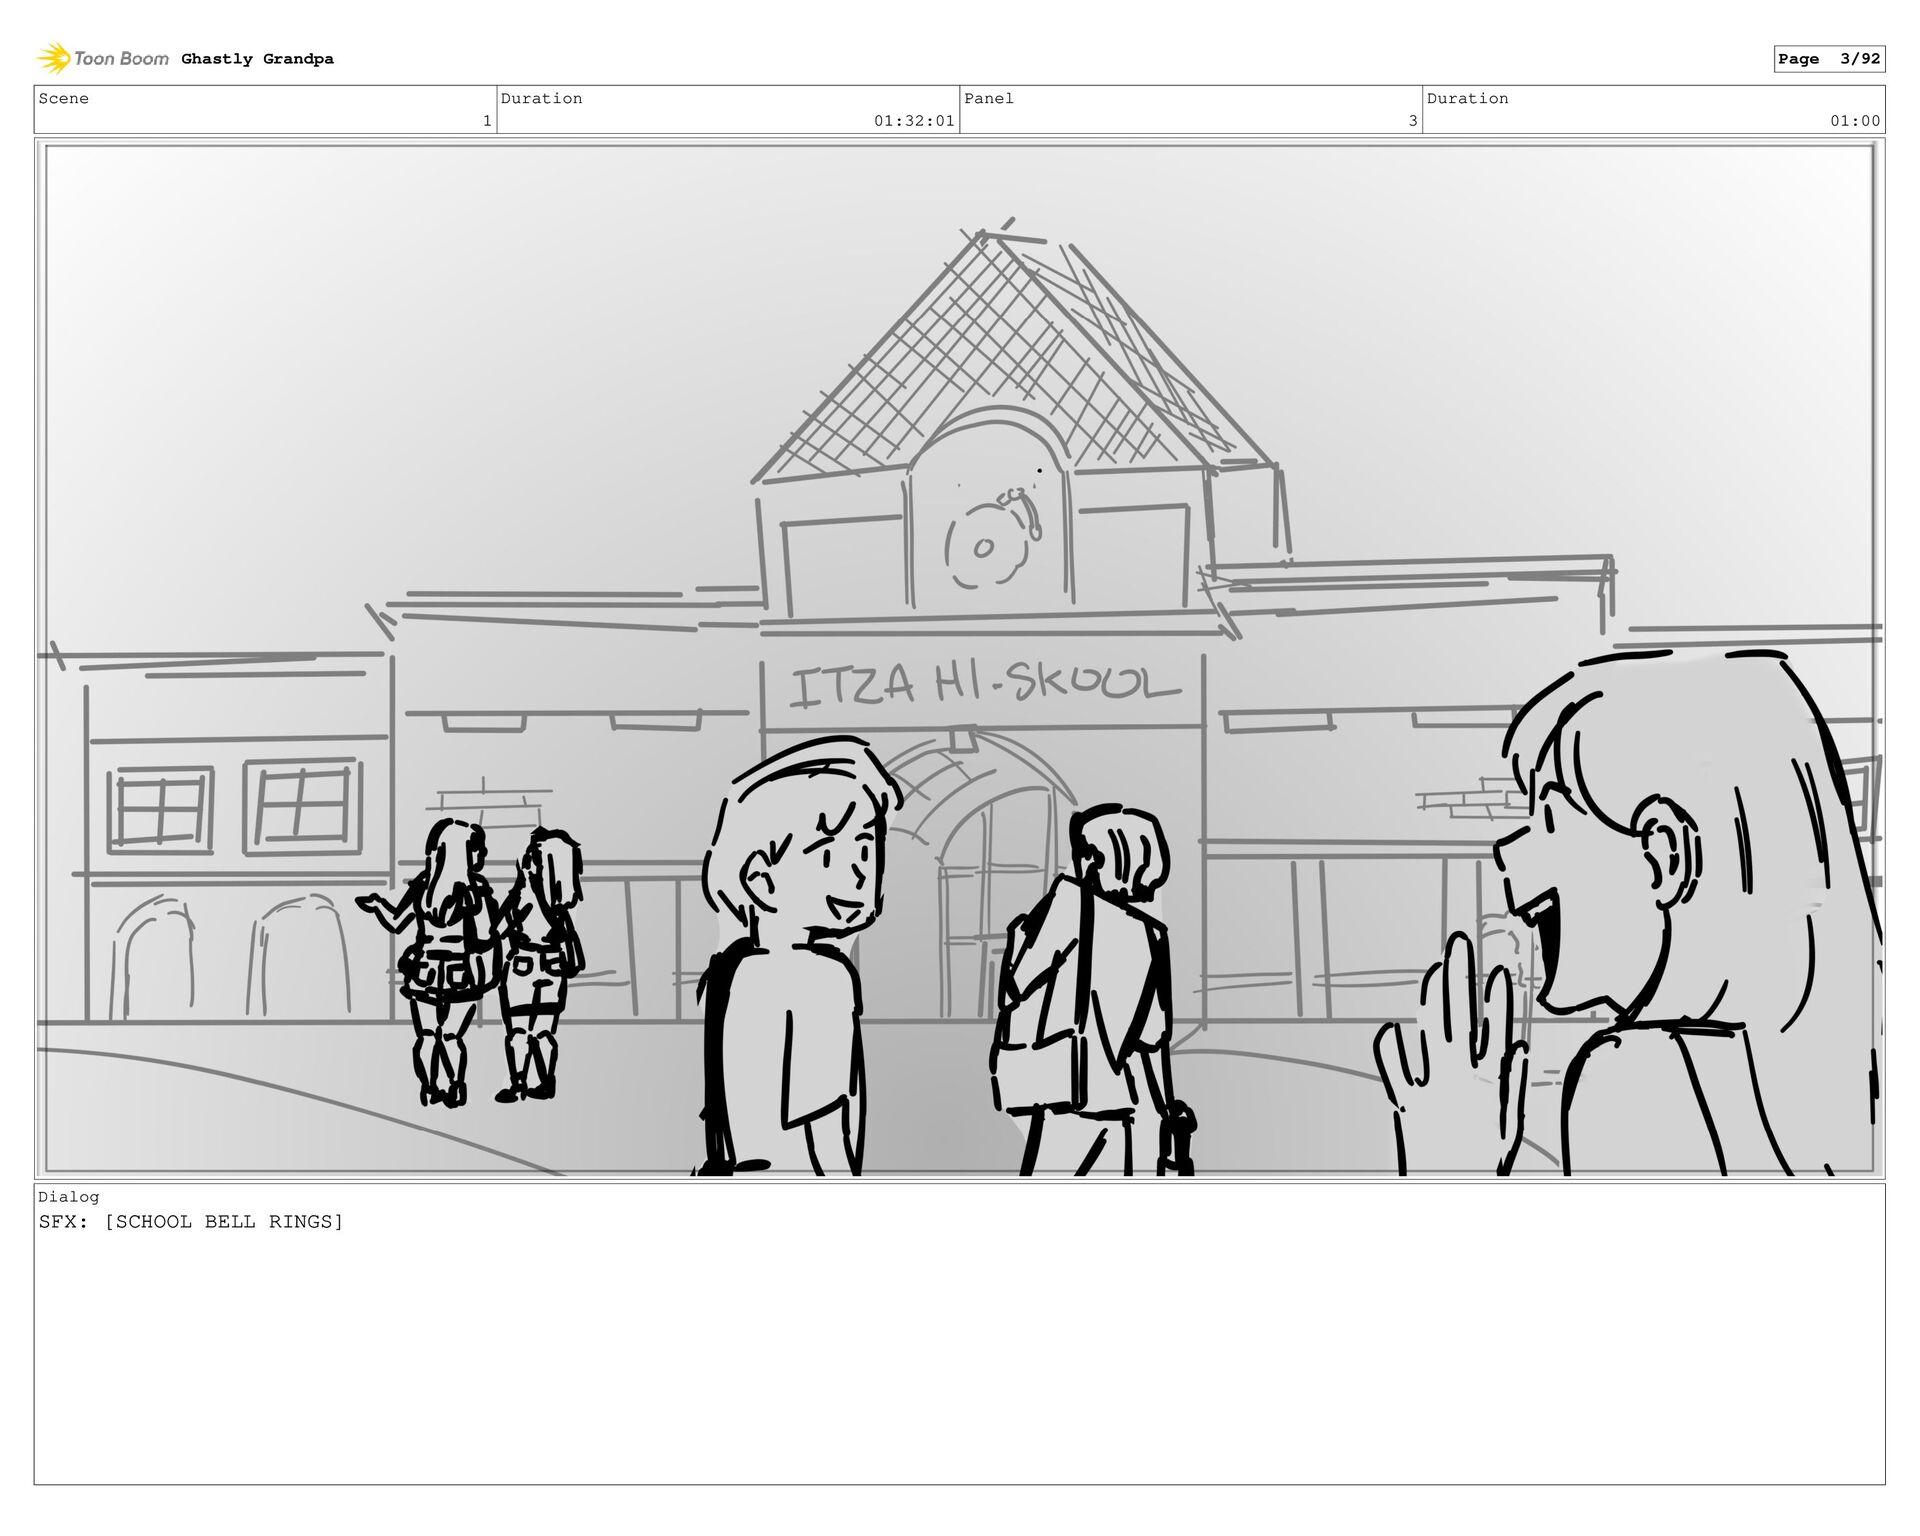 Scene 1 Duration 01:27:01 Panel 2 Duration 01:0...